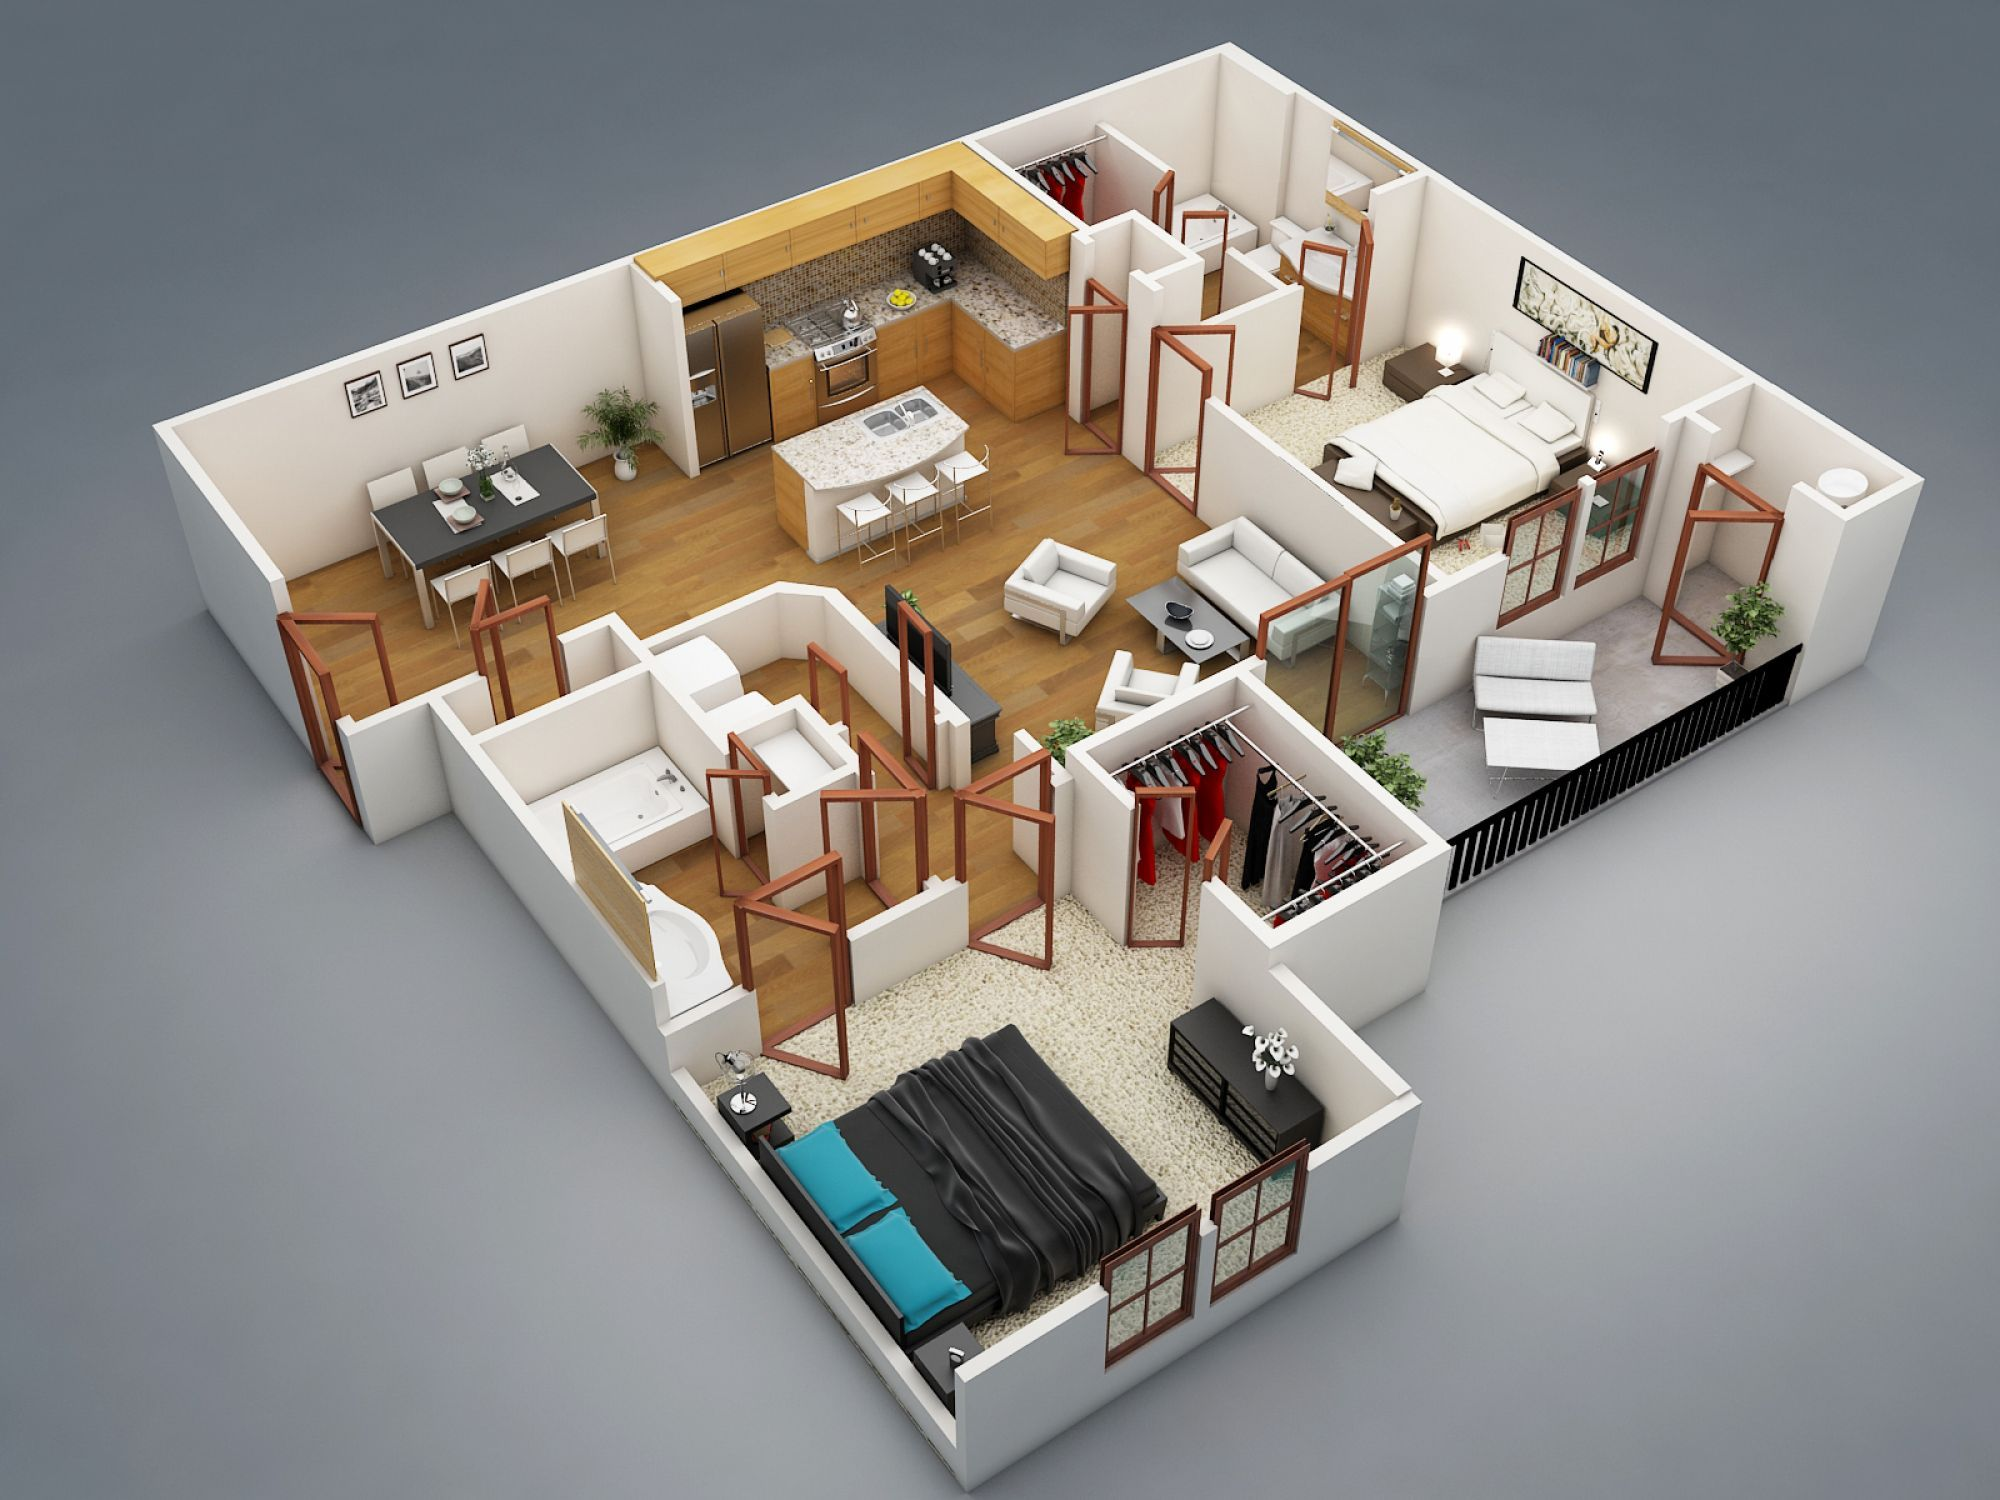 3d floor plan of 2 bedroom house 3d rendering on the basis of 2d